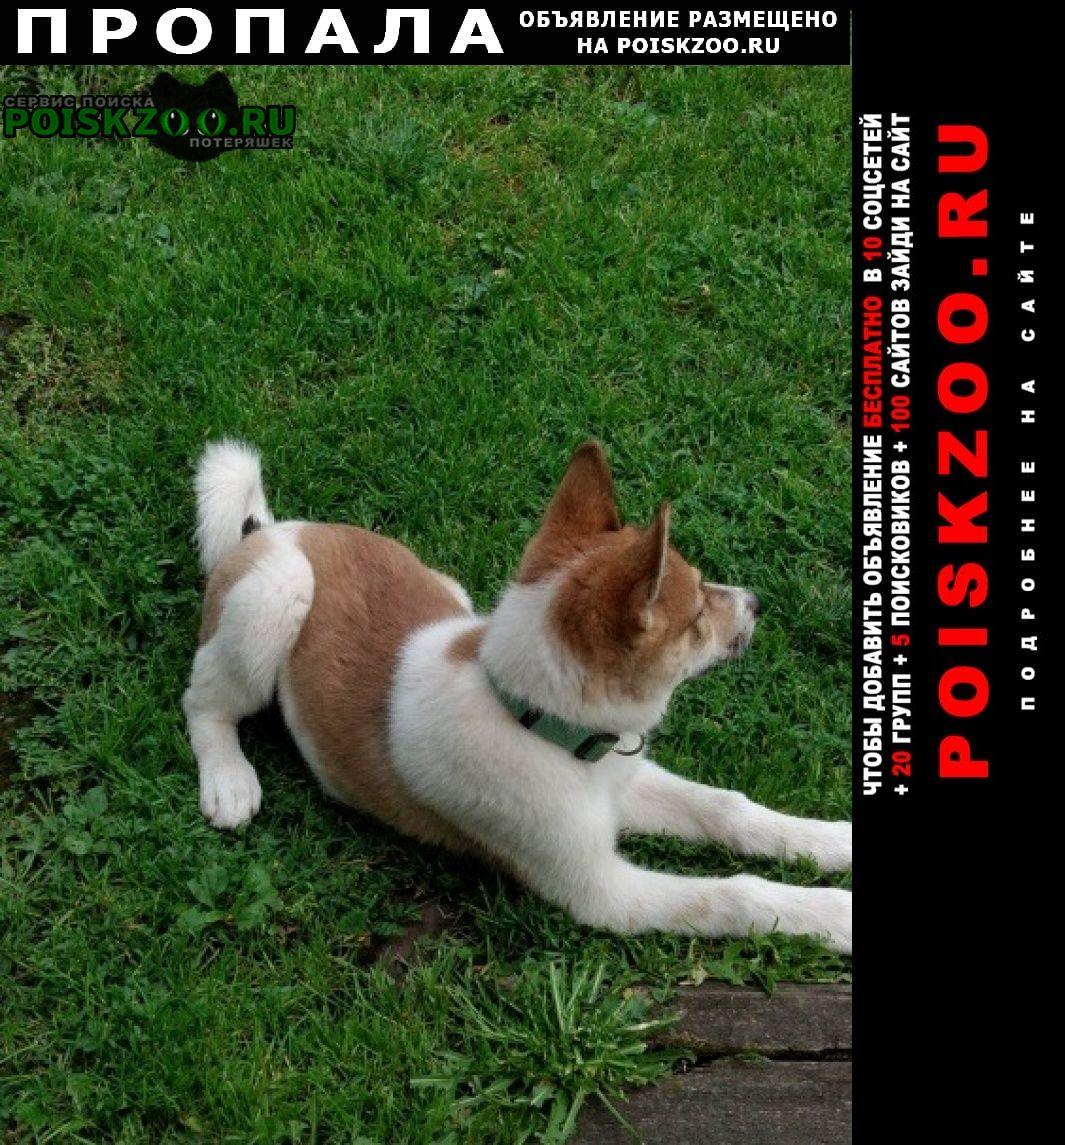 Пропала собака щенок лайки Верхняя Пышма